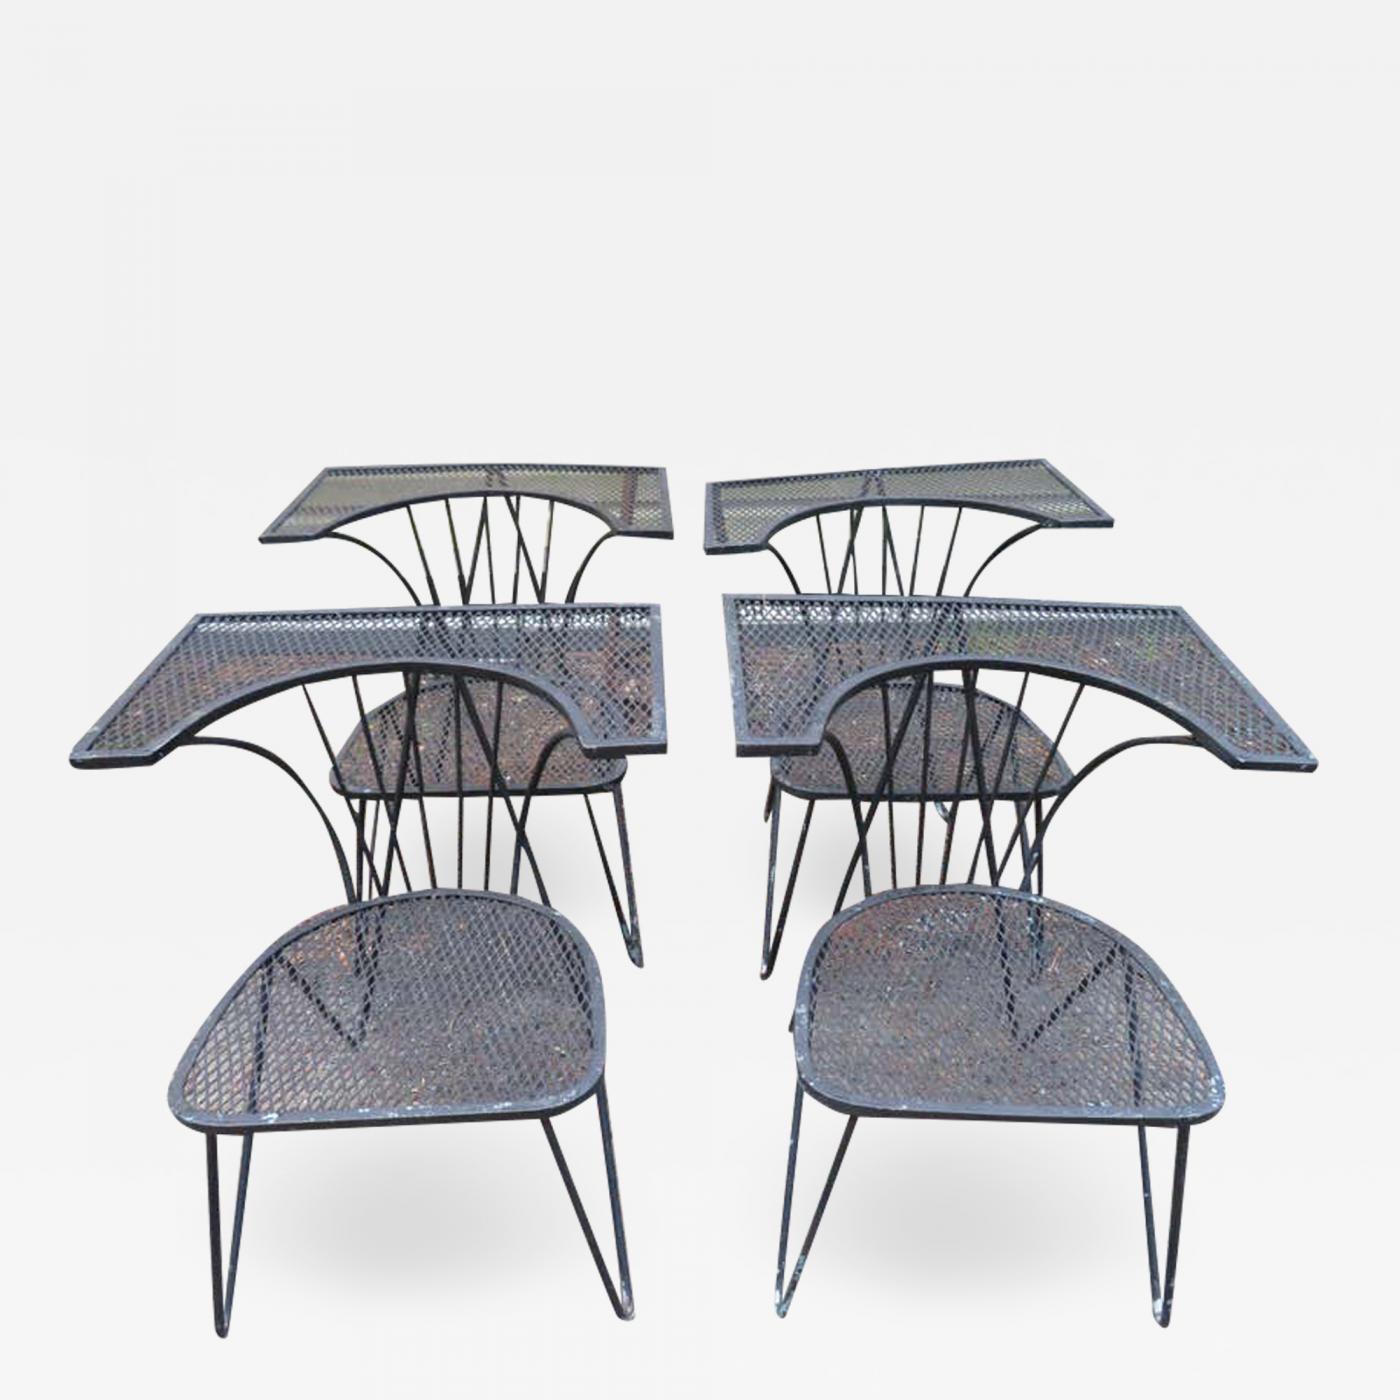 john salterini unusual set of 4 geometric salterini patio chairs mid century modern